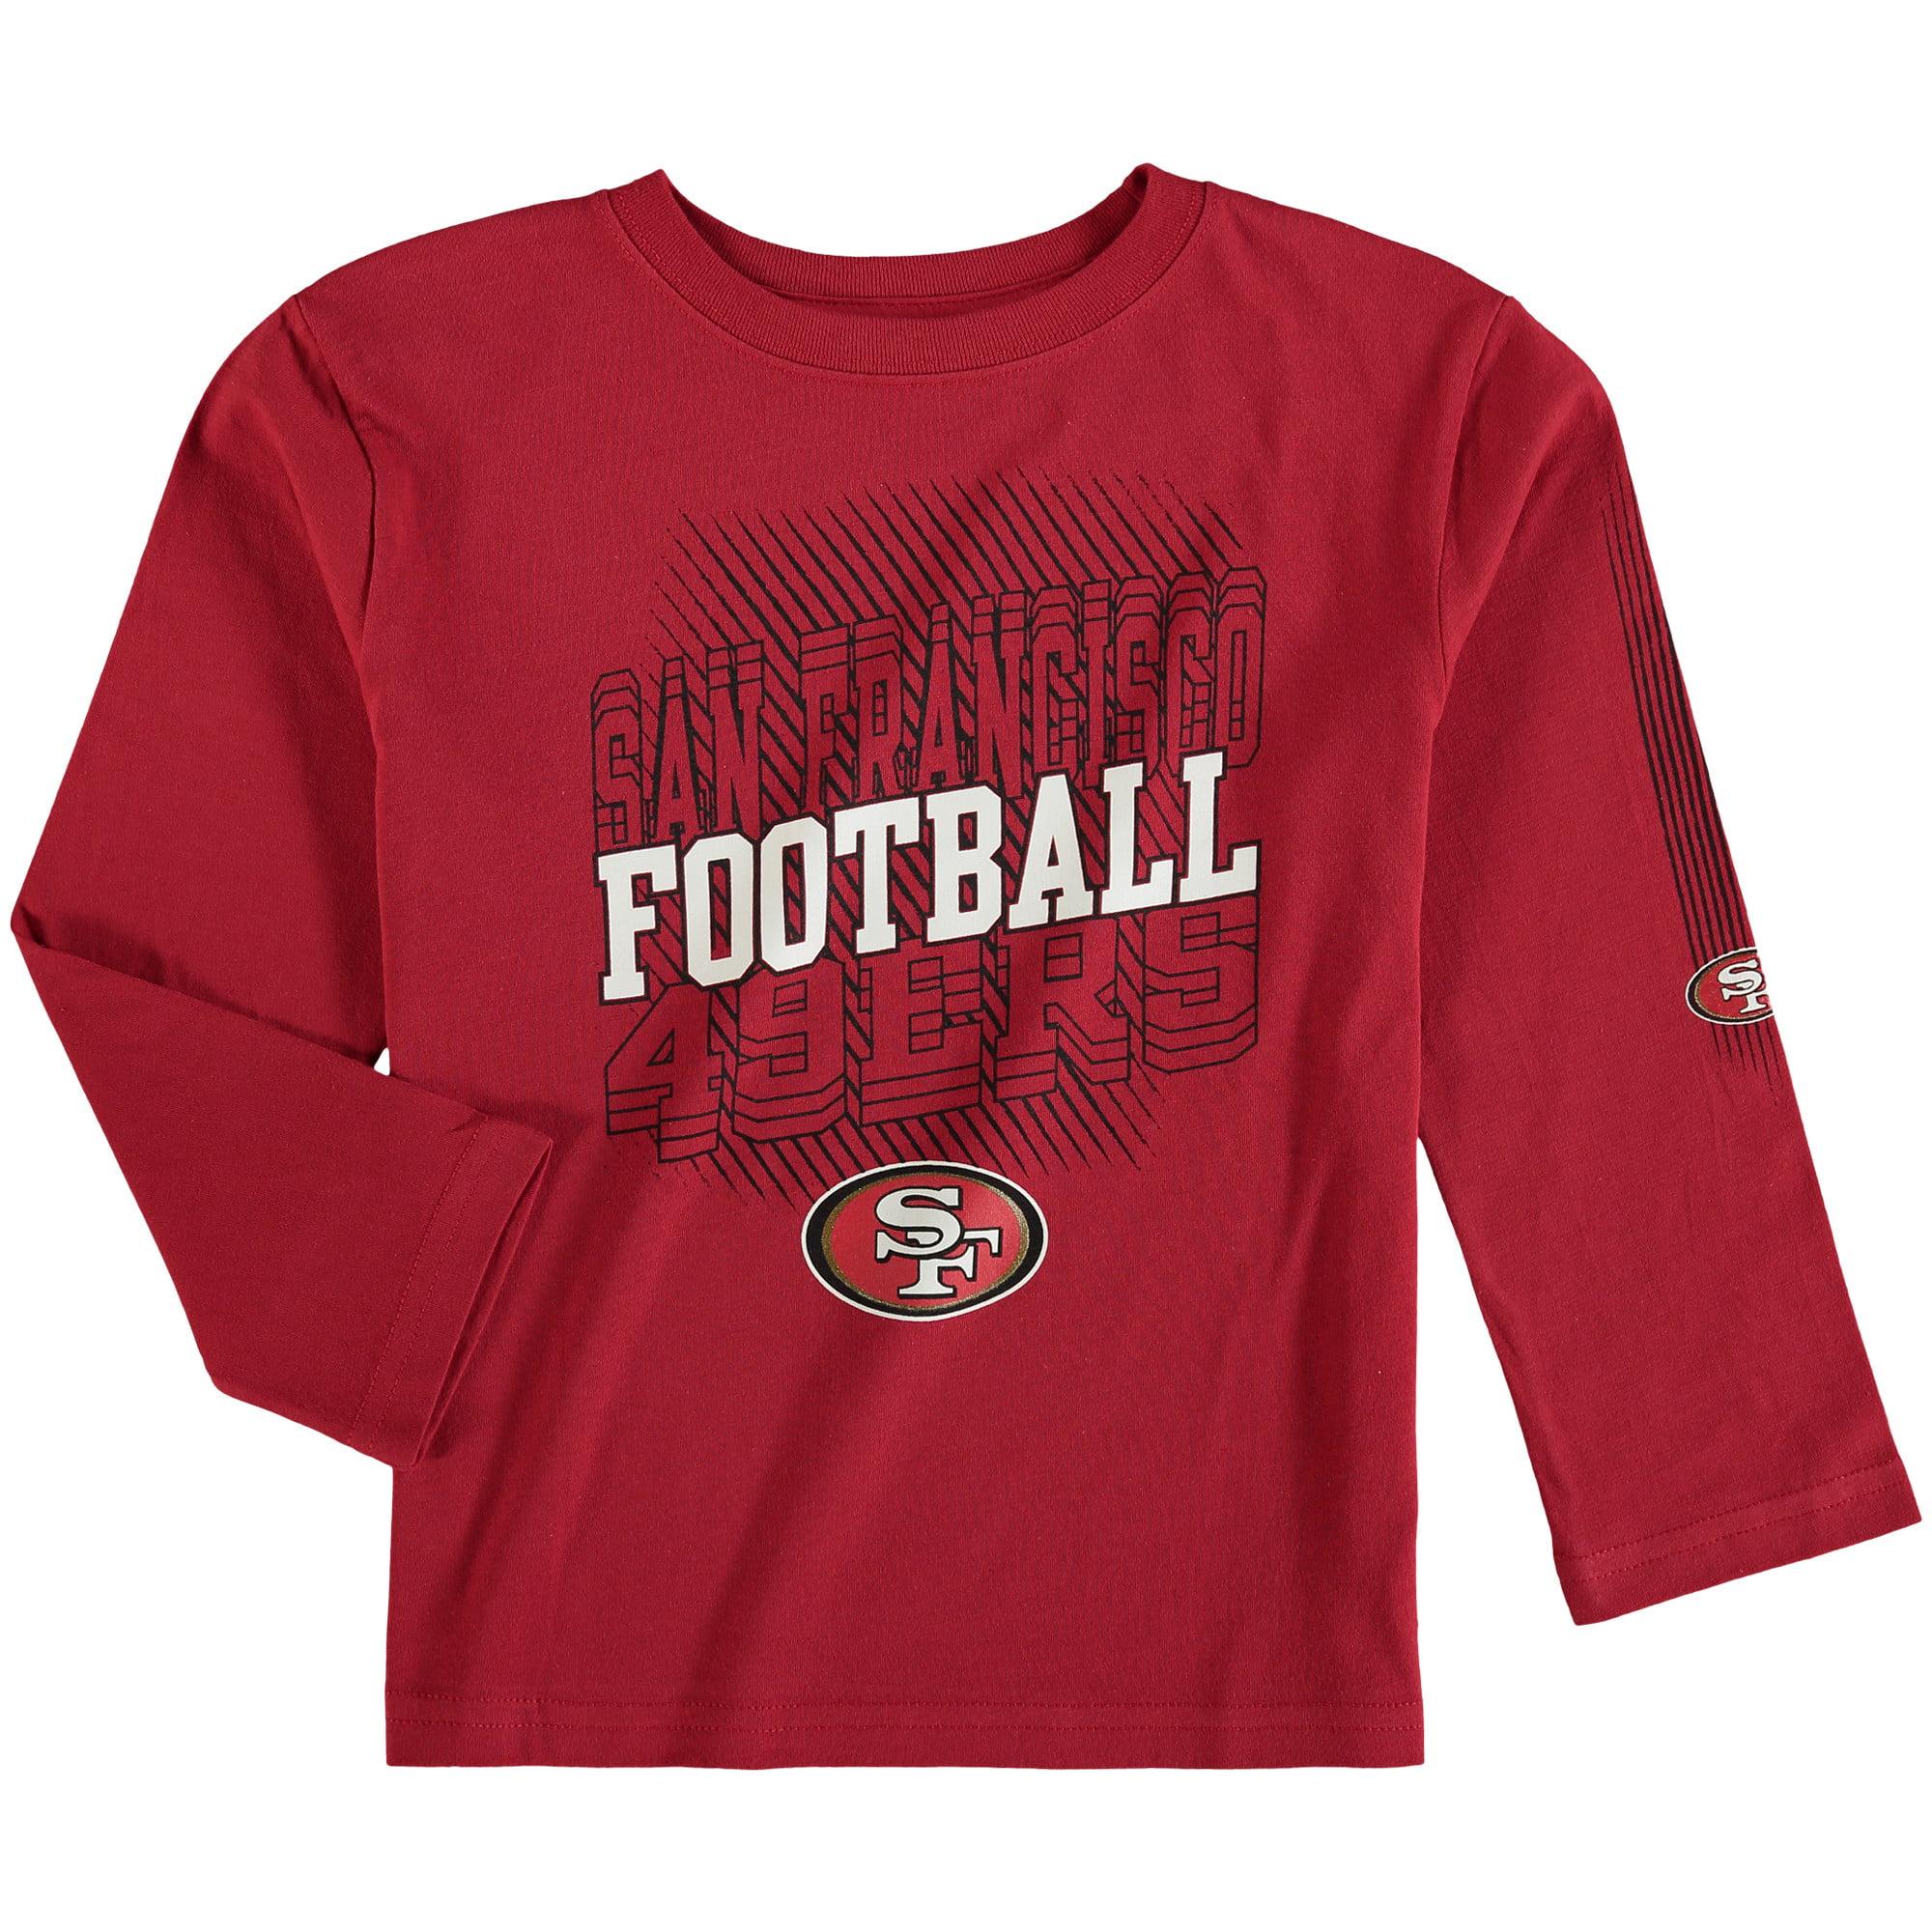 San Francisco 49ers Preschool Frequency Long Sleeve T-Shirt - Scarlet